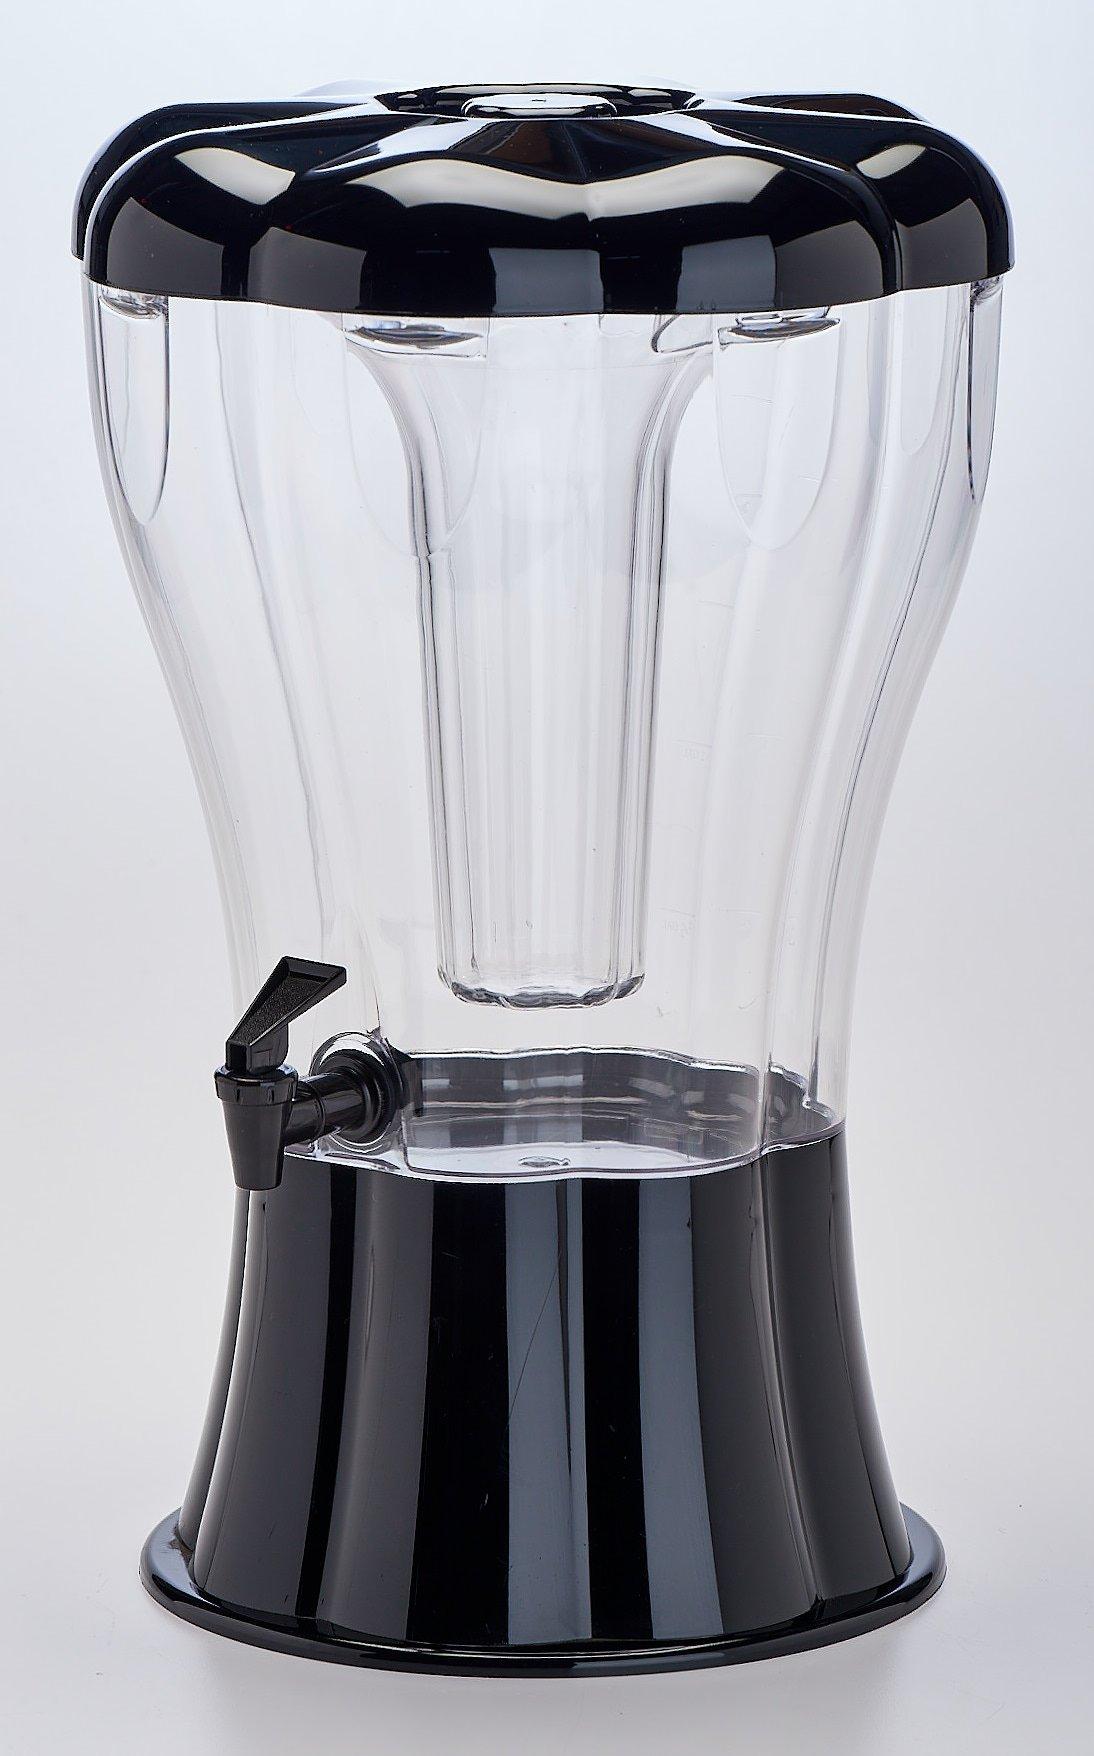 Buddeez NEW w 3.5 Gallon Break Resistant Beverage Dispenser with Ice Cone-Sleek Black